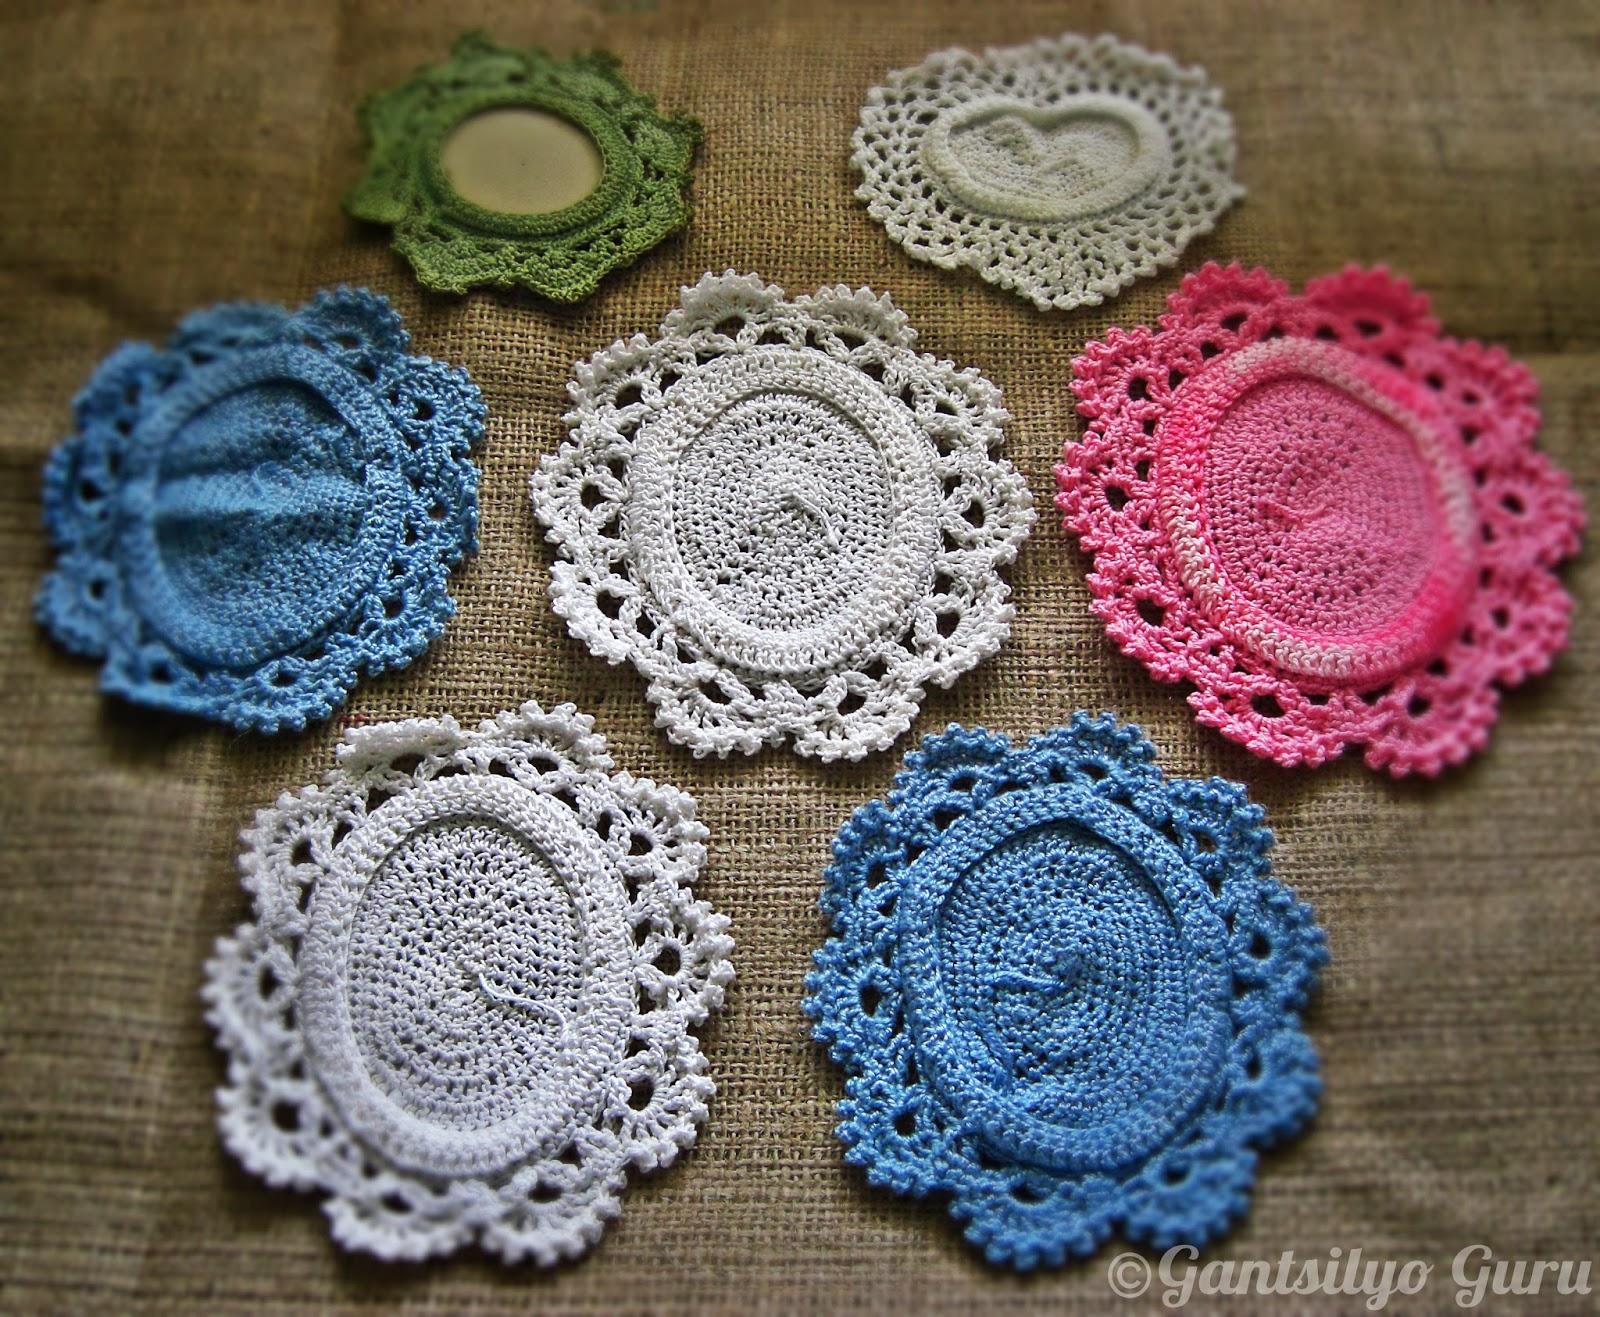 Crochet Guru : Gantsilyo Guru: My Crochet Fixation For The Past Weeks